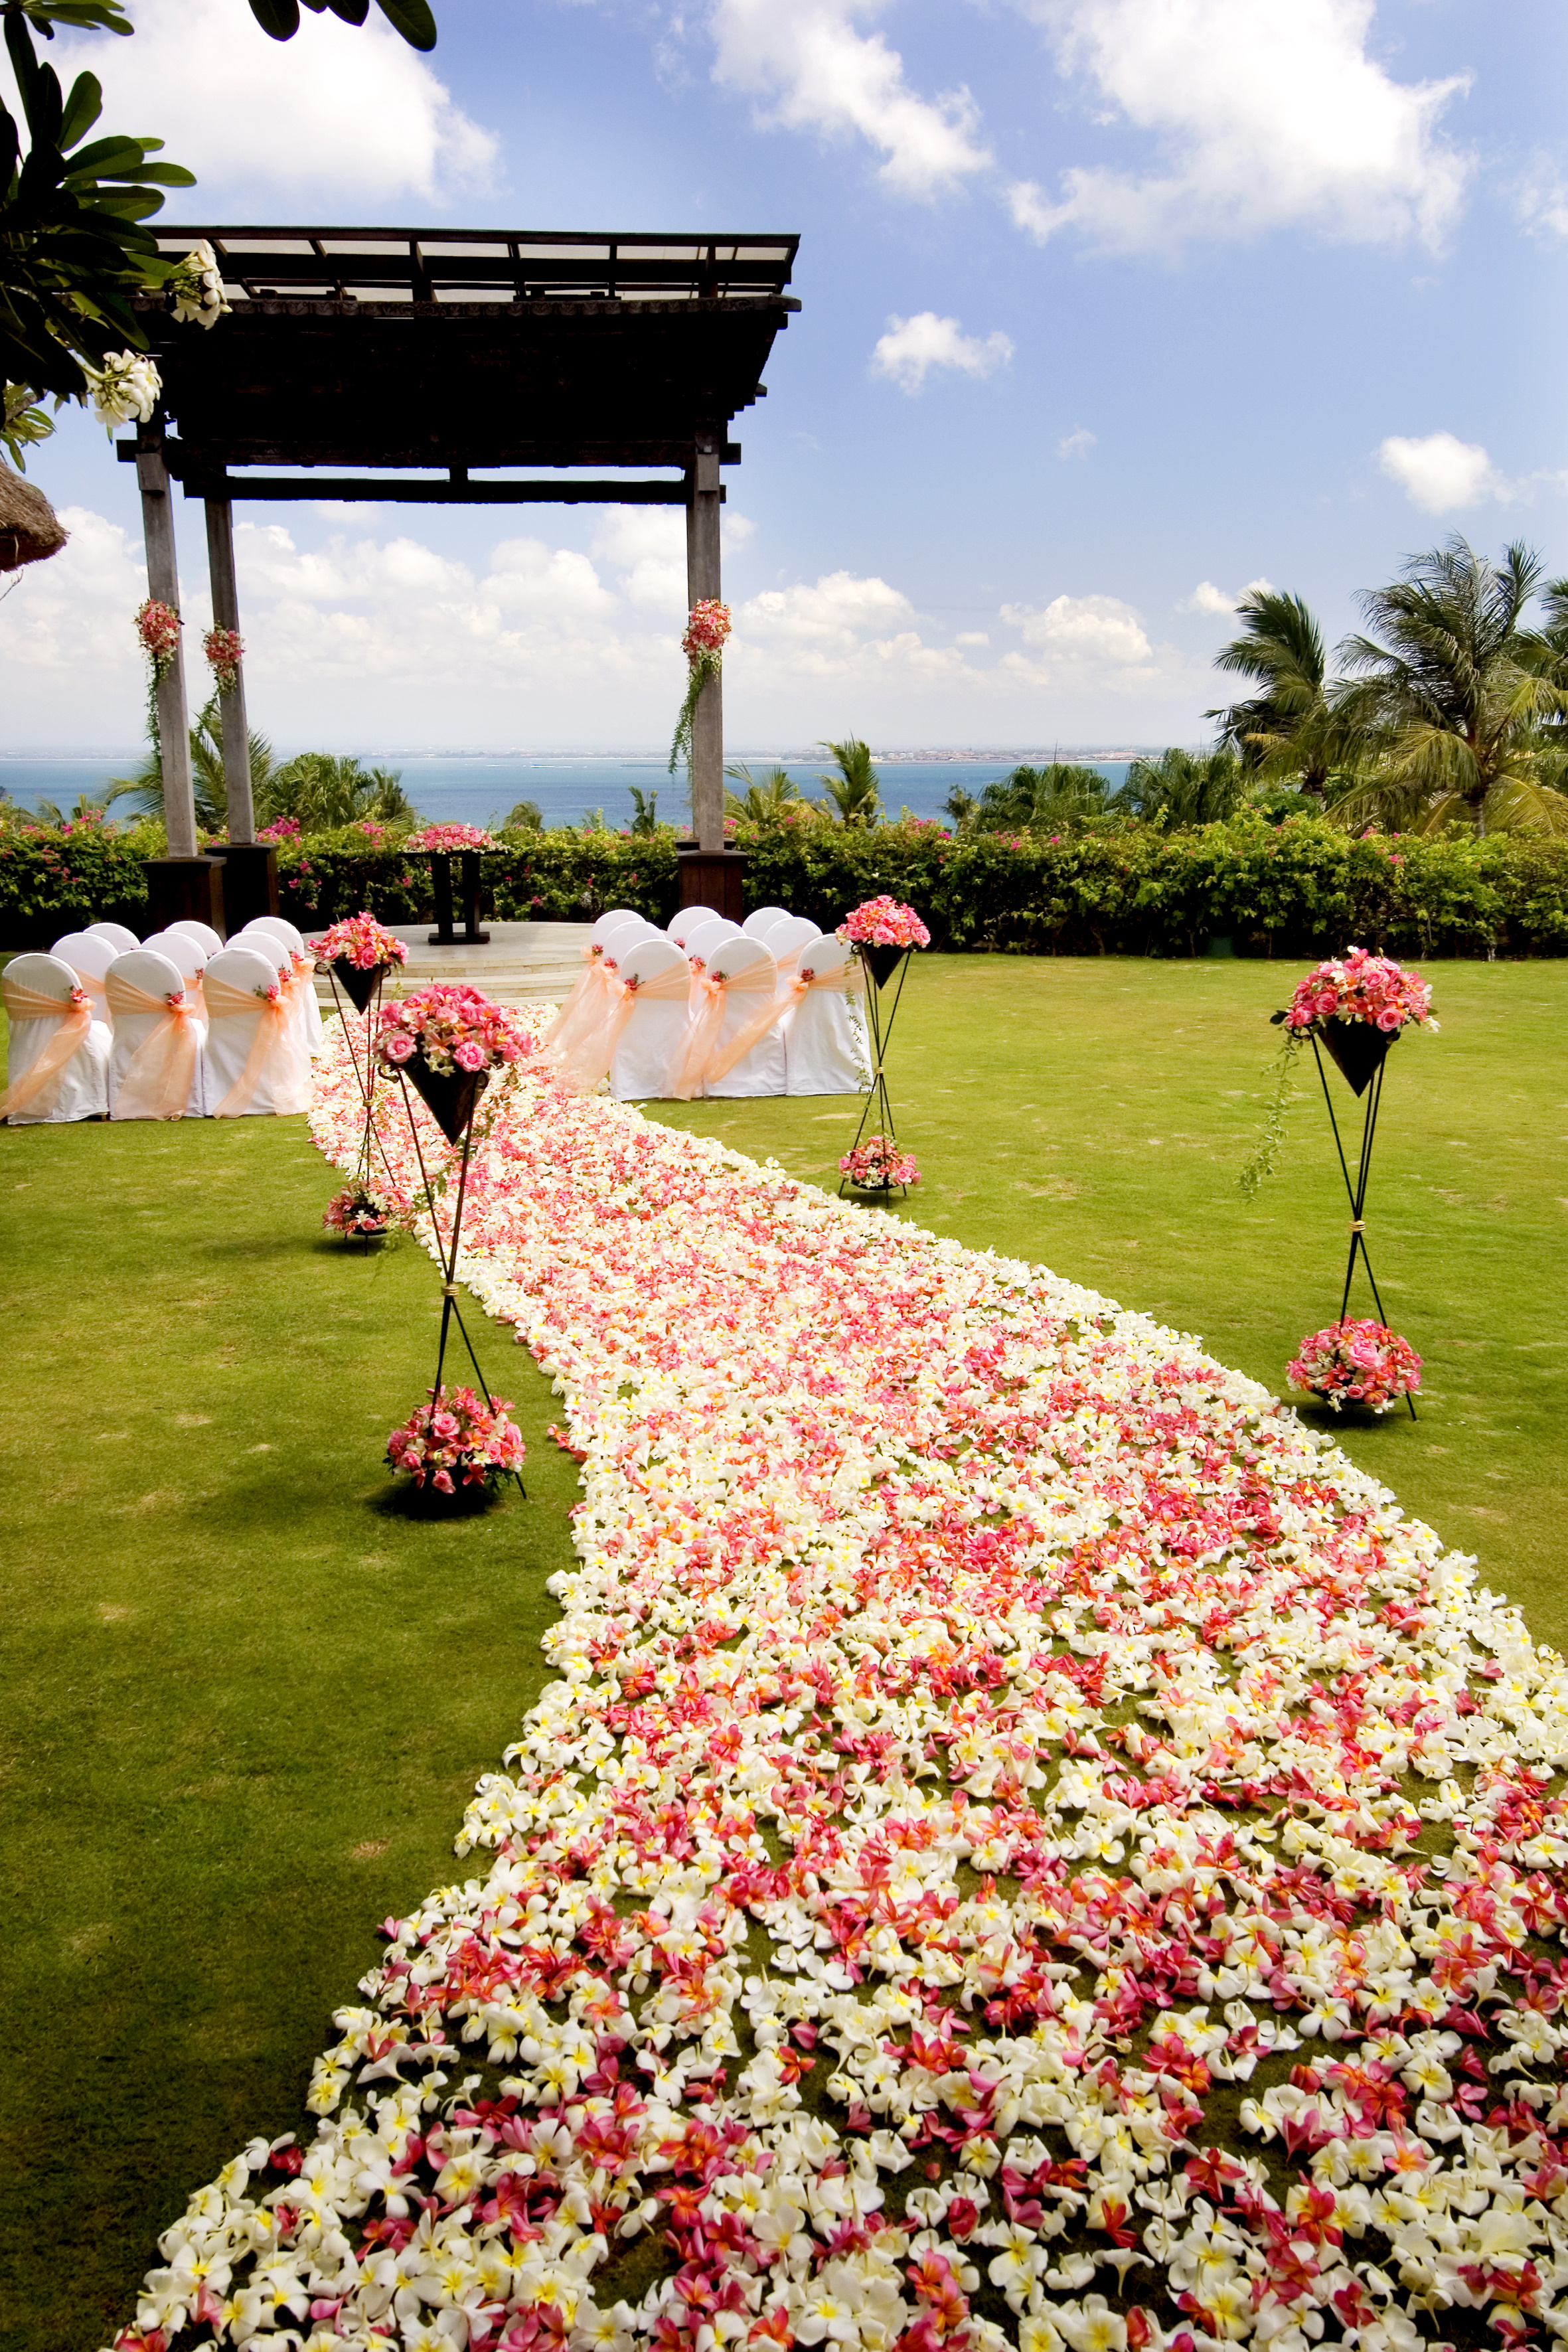 3. Ayana wedding 照片